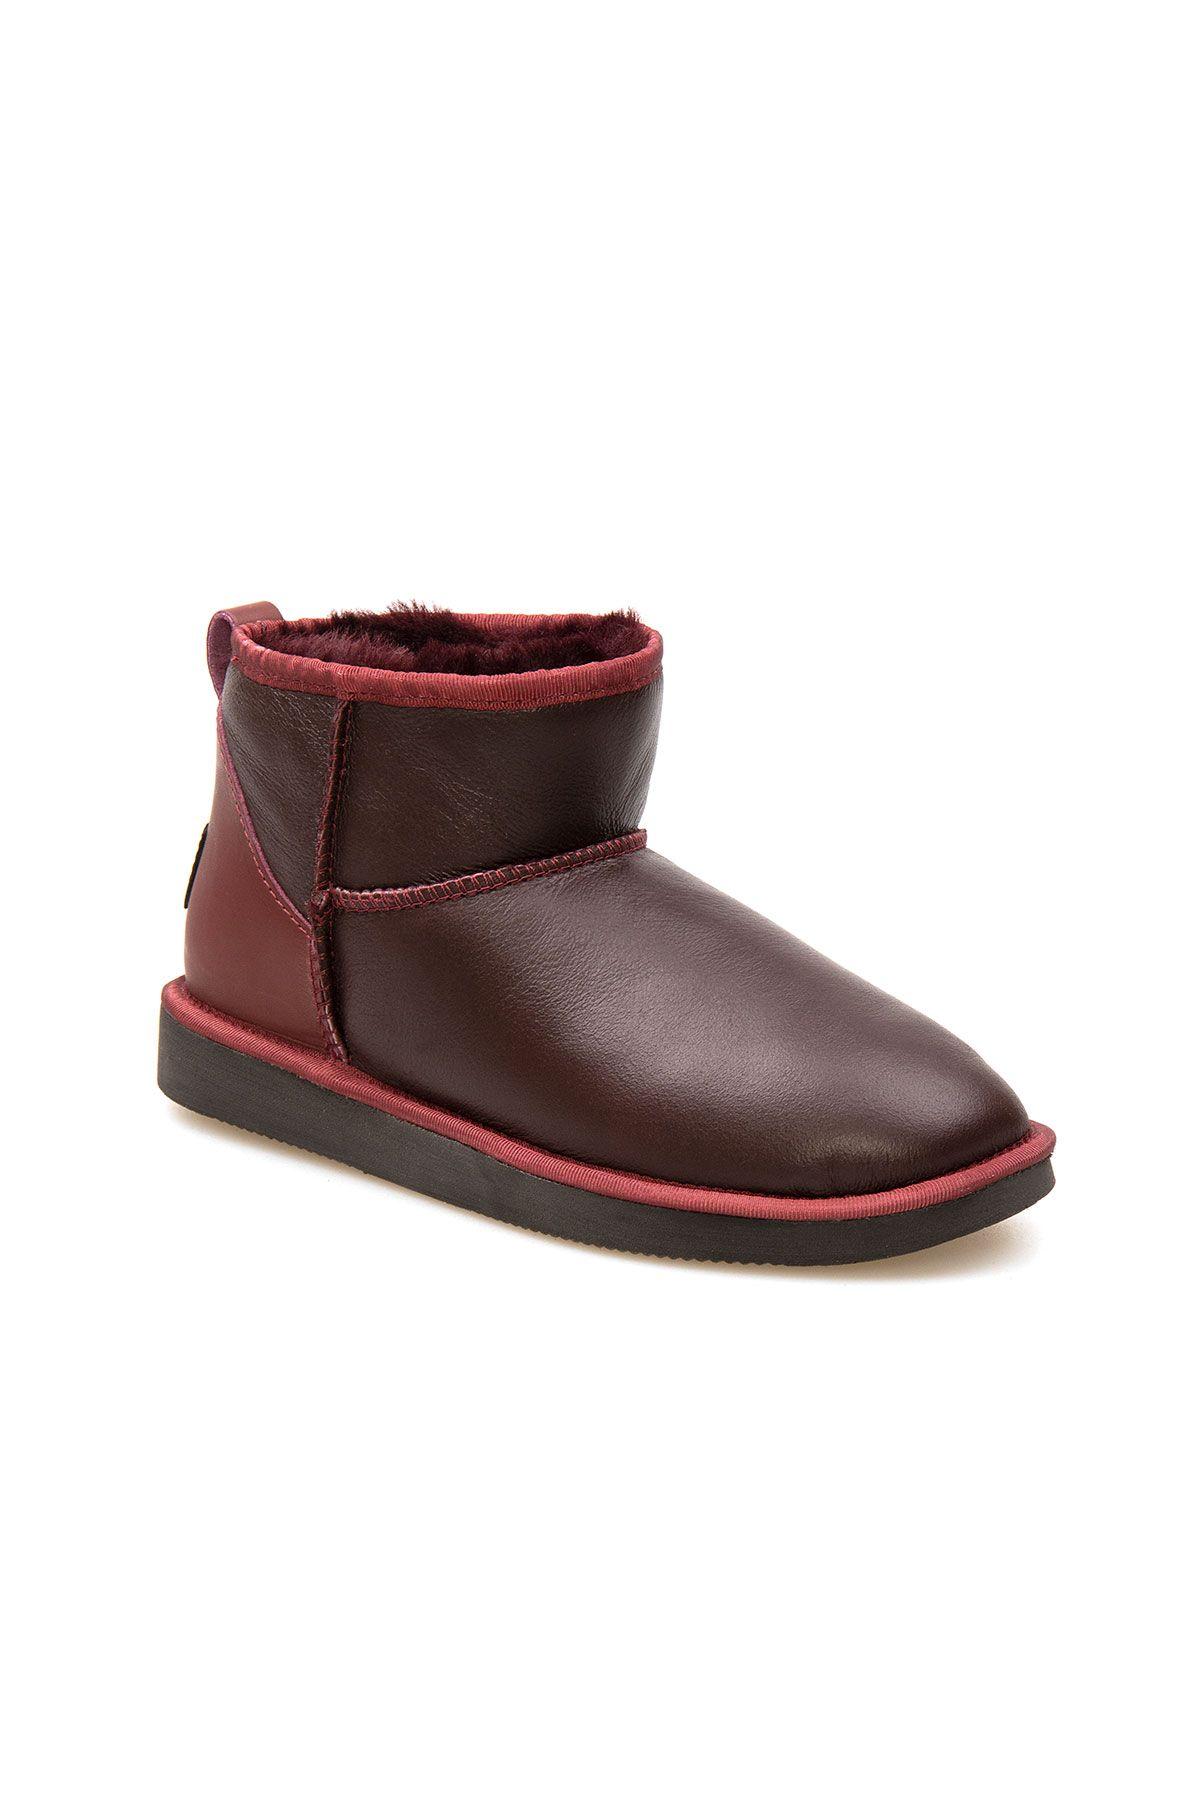 Pegia Genuine Leather Women's Mini Boots 191131 Claret red